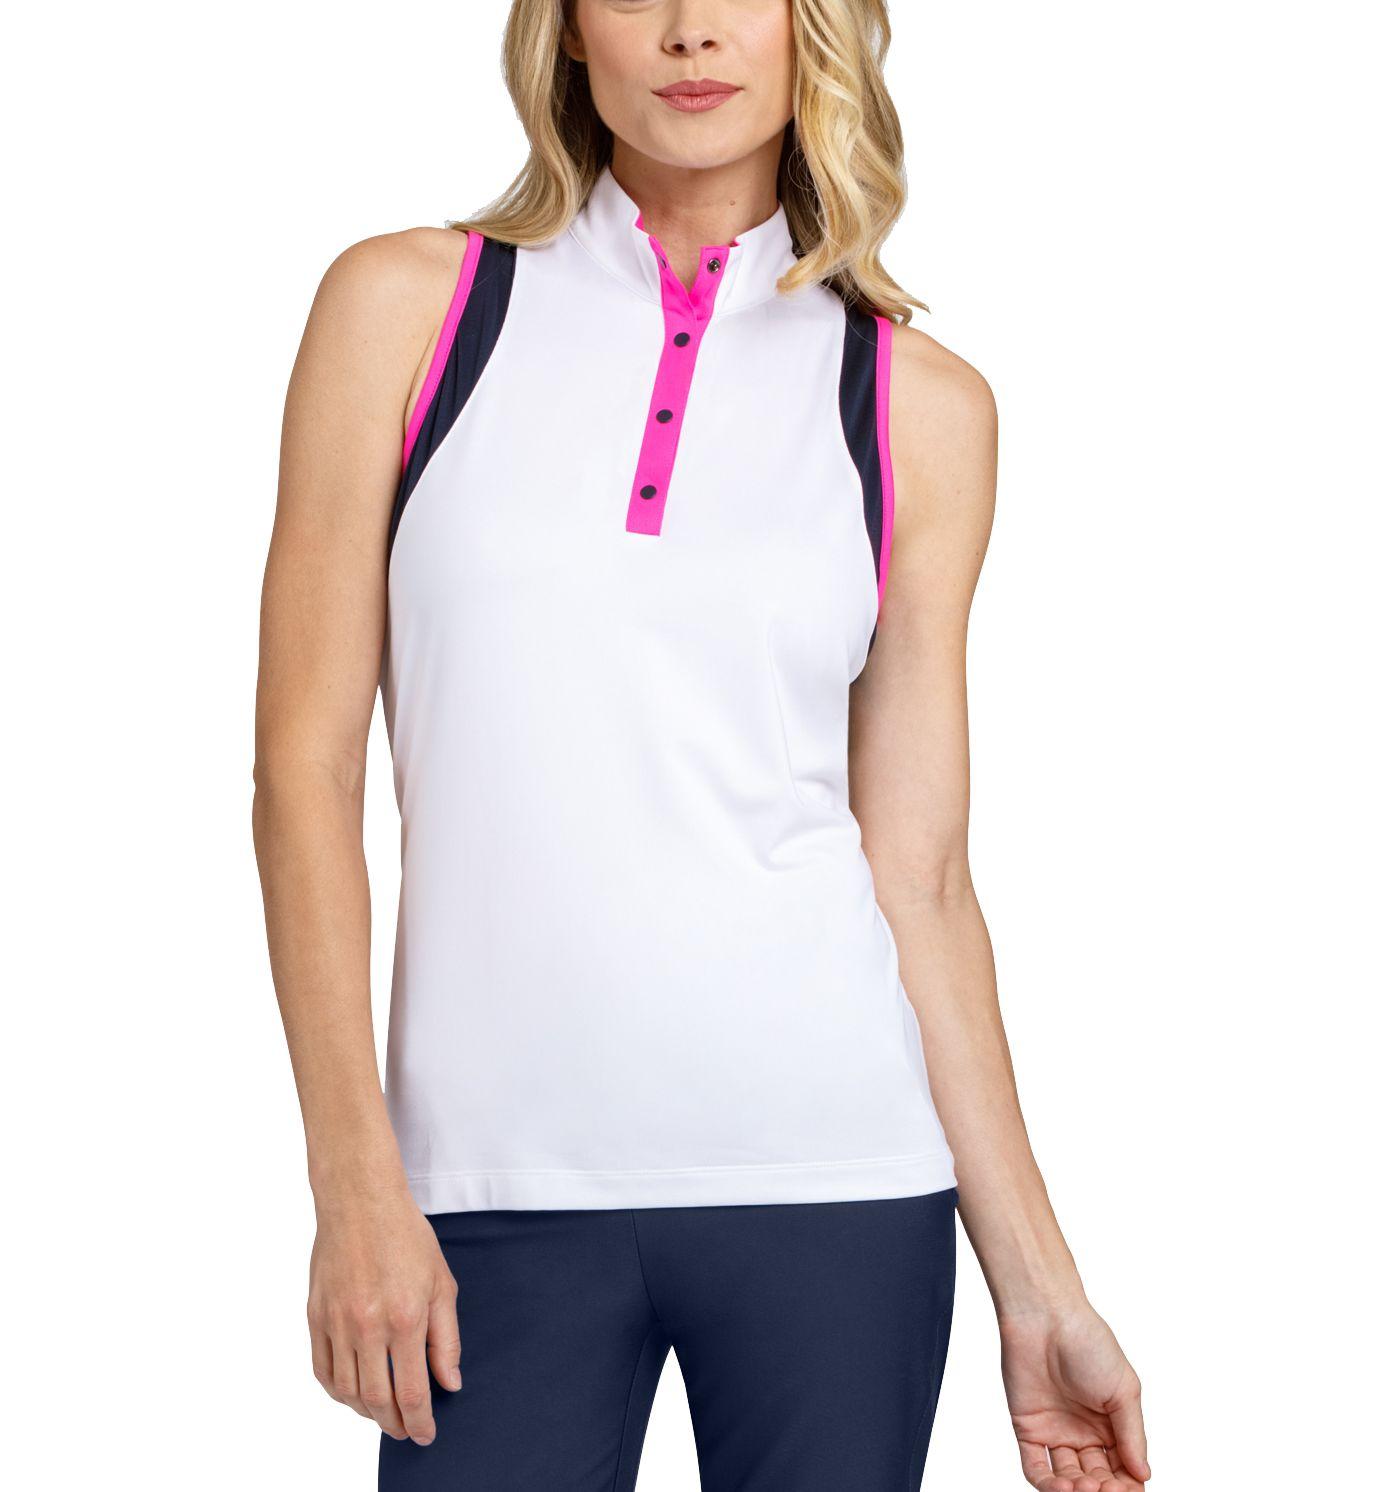 Tail Women's Sleeveless Convertible Collar Racer Back Golf Top